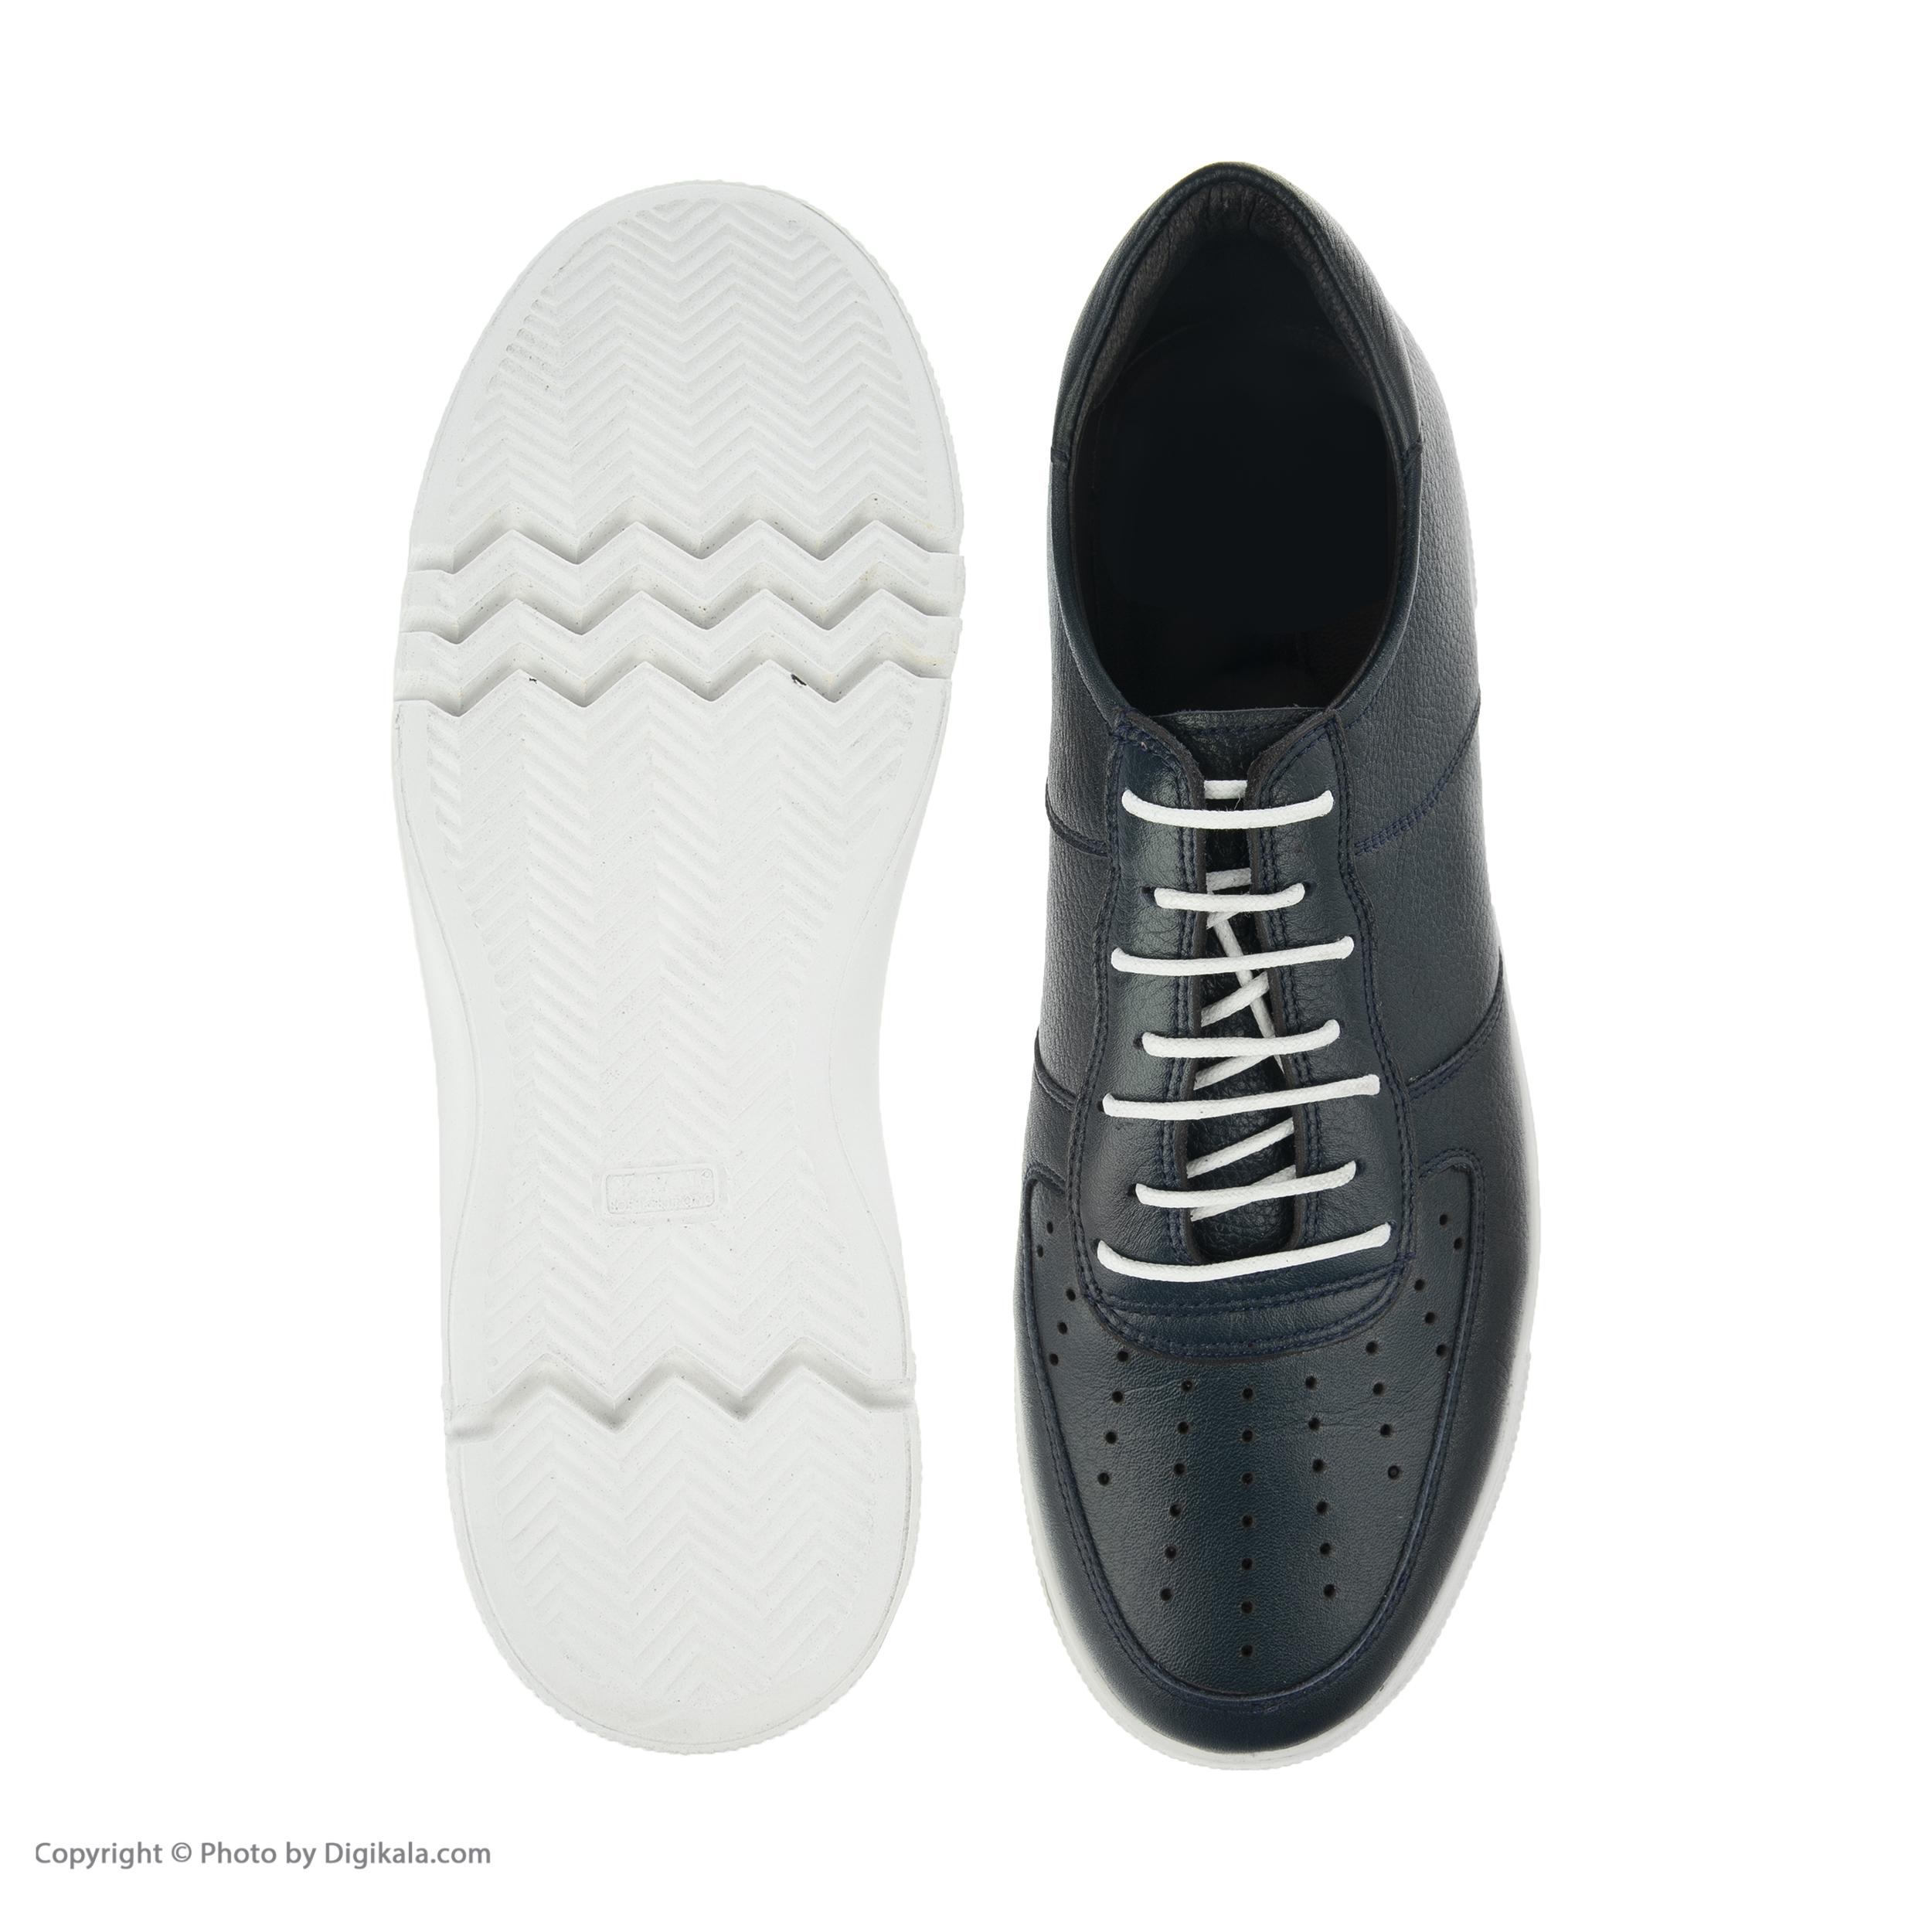 کفش روزمره مردانه برتونیکس مدل O-954-16